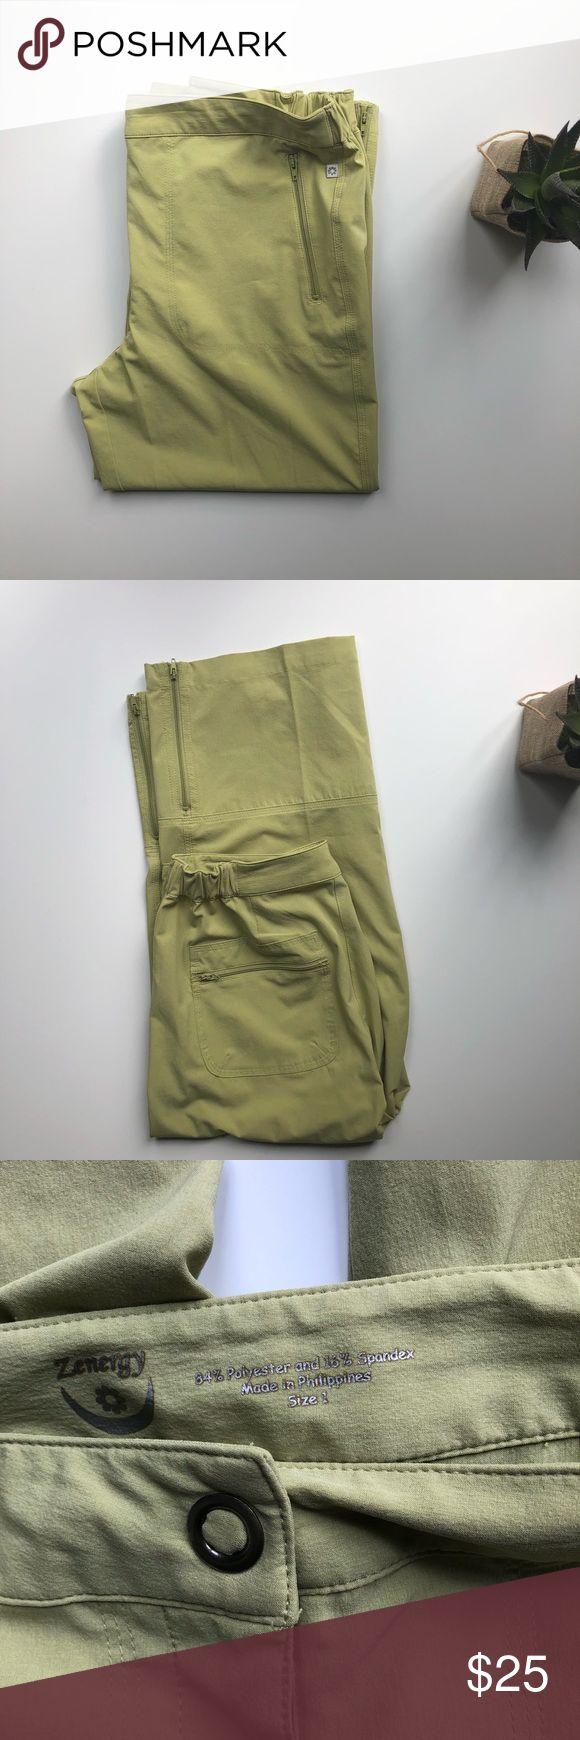 Chico's Green Zenergy Capris Chico's Zenergy Capris • light, sage green • zipped pockets • zippered calf/leg detail • elastic waistband • snap and zipper fly • size 1 (medium) • EUC Chico's Pants Capris